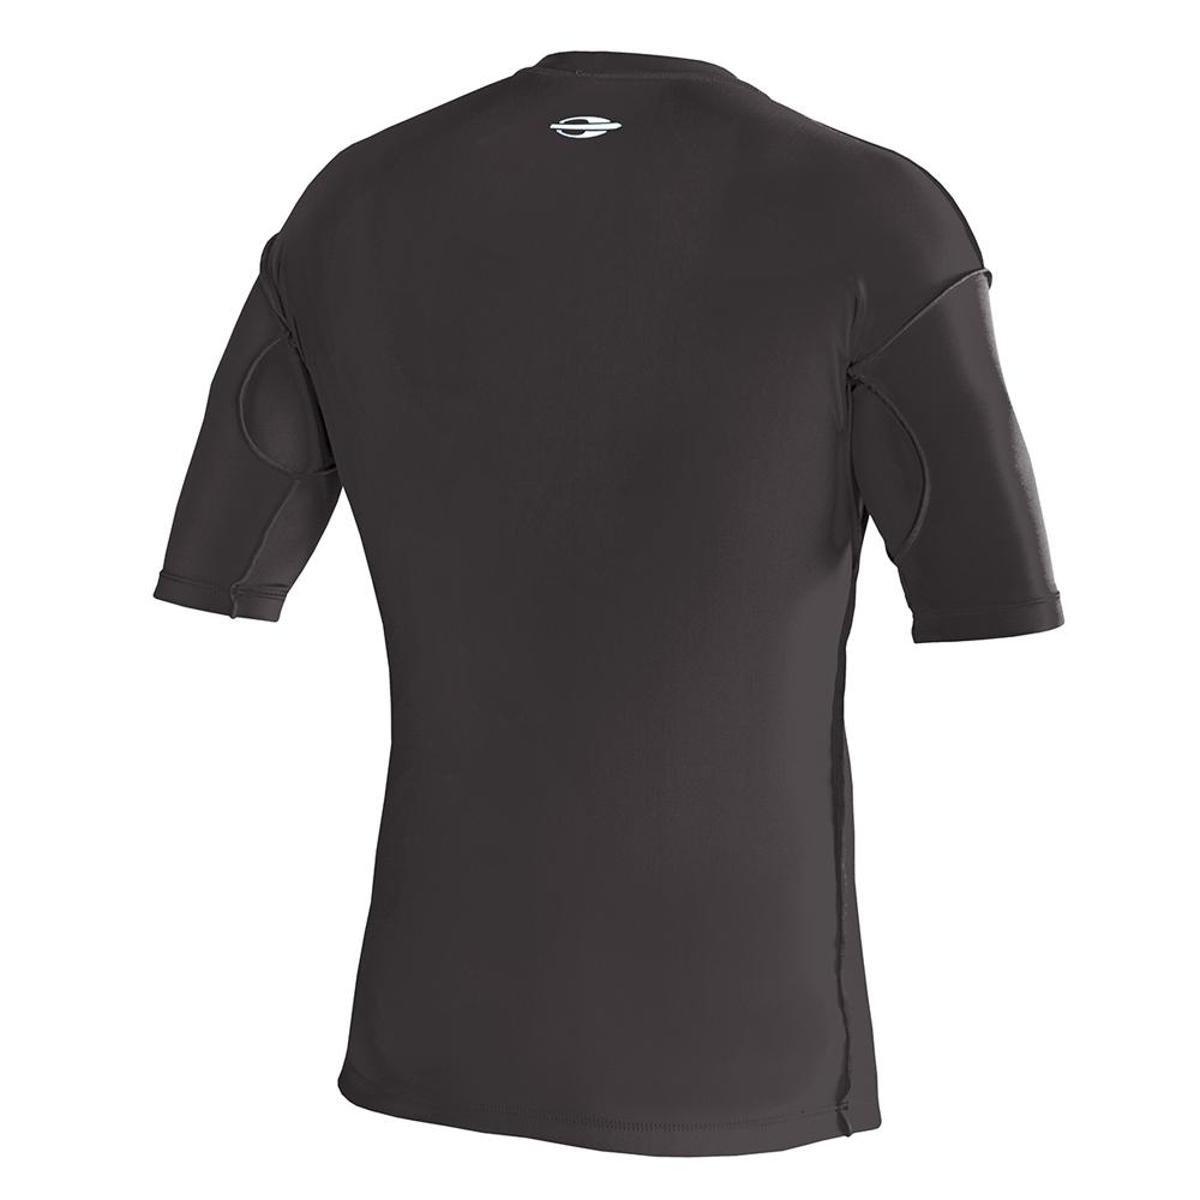 Camisa Mormaii Manga Curta Extraline Neo Lycra® Uv Masculina ... 5731e1361e